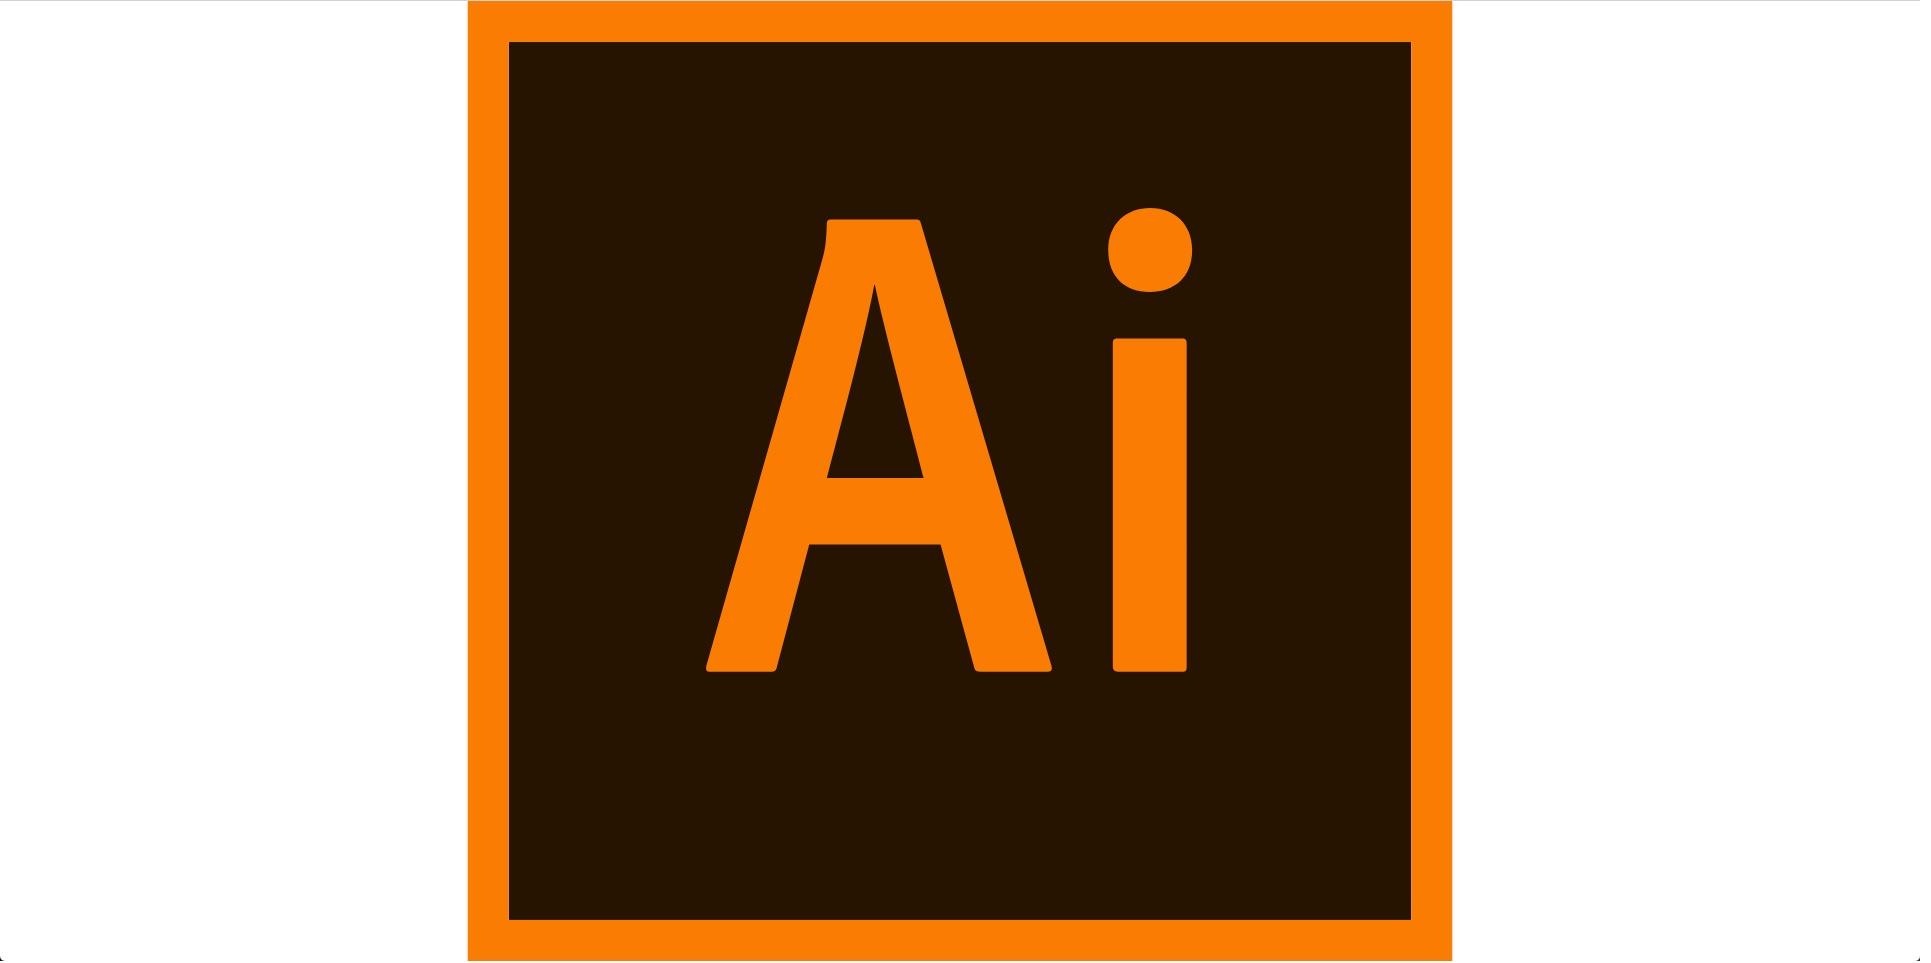 IllustratorやPhotoshopなど一部アプリがmacOS High Sierraで不具合、Adobeがサポートページを公開